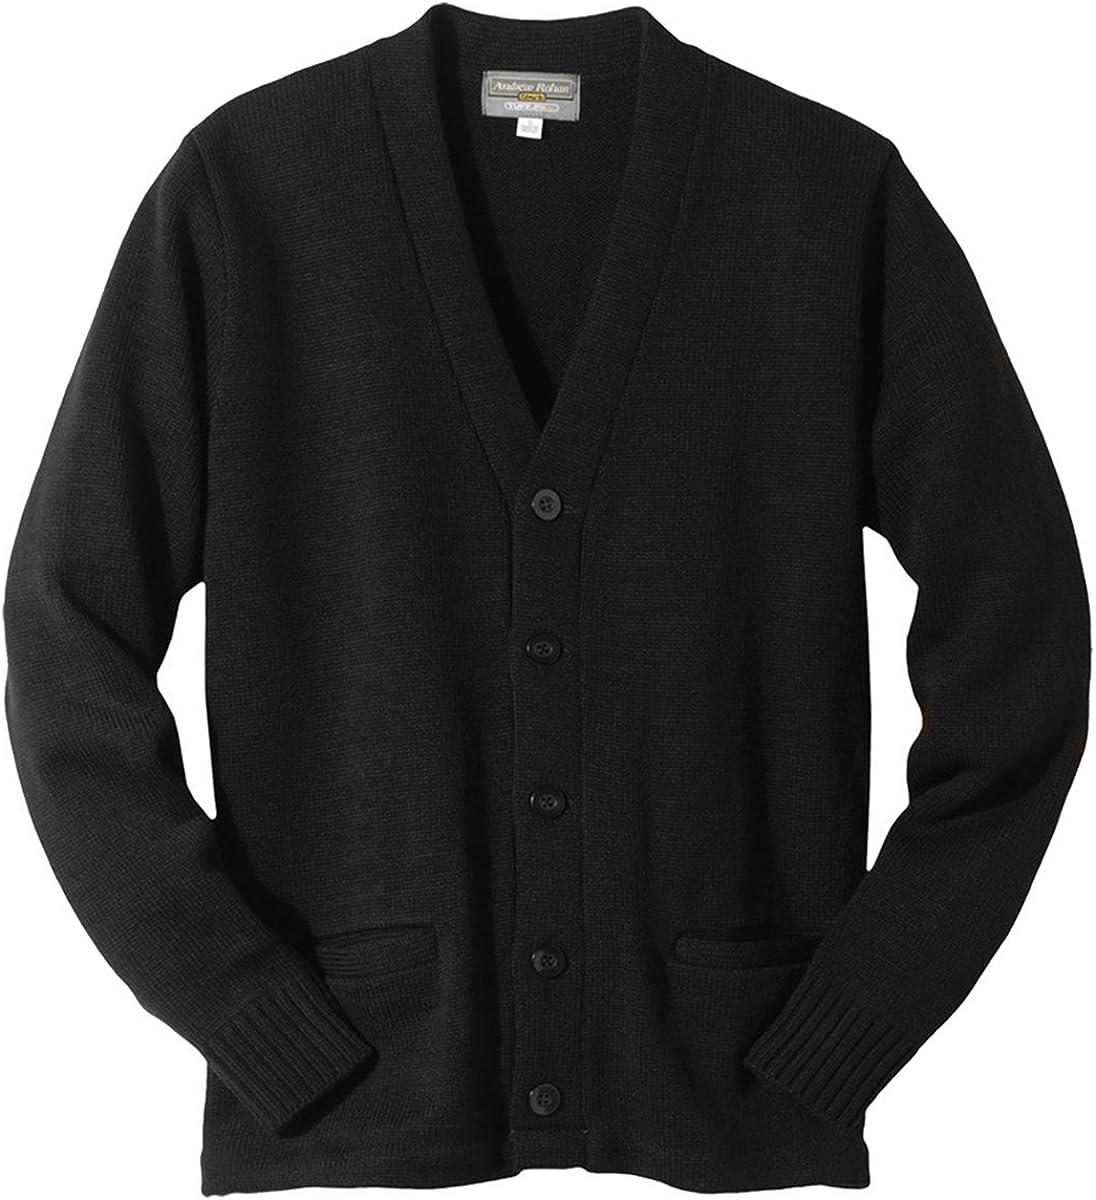 Edwards V-Neck Button Acrylic Cardigan Sweater Medium RED